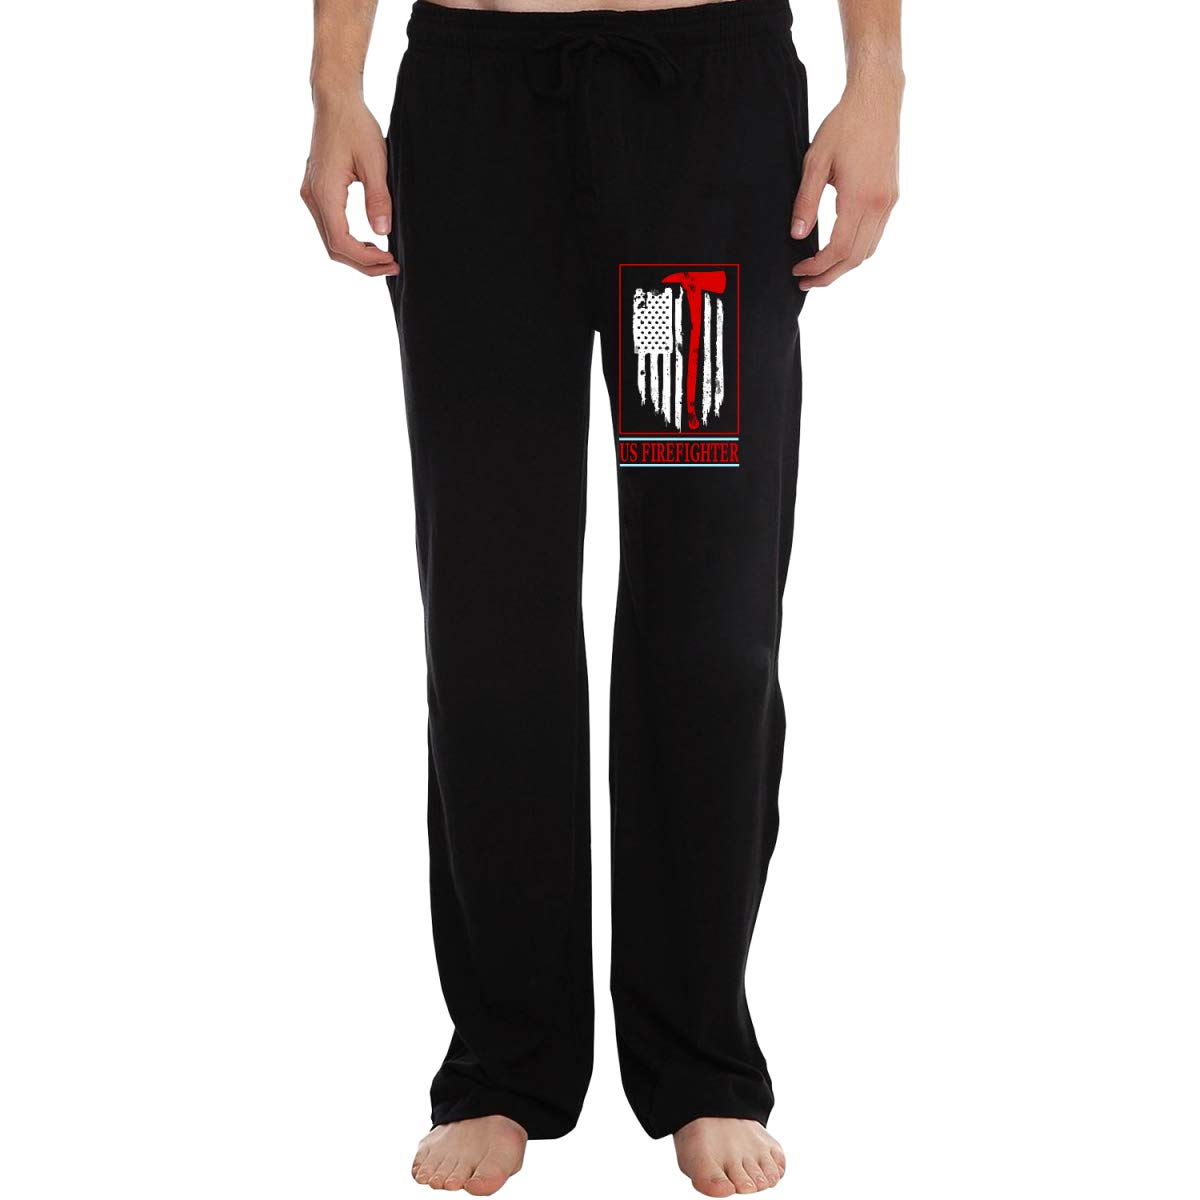 HSNiiY US - Pantalones de chándal de algodón para Bomberos, Hombre ...